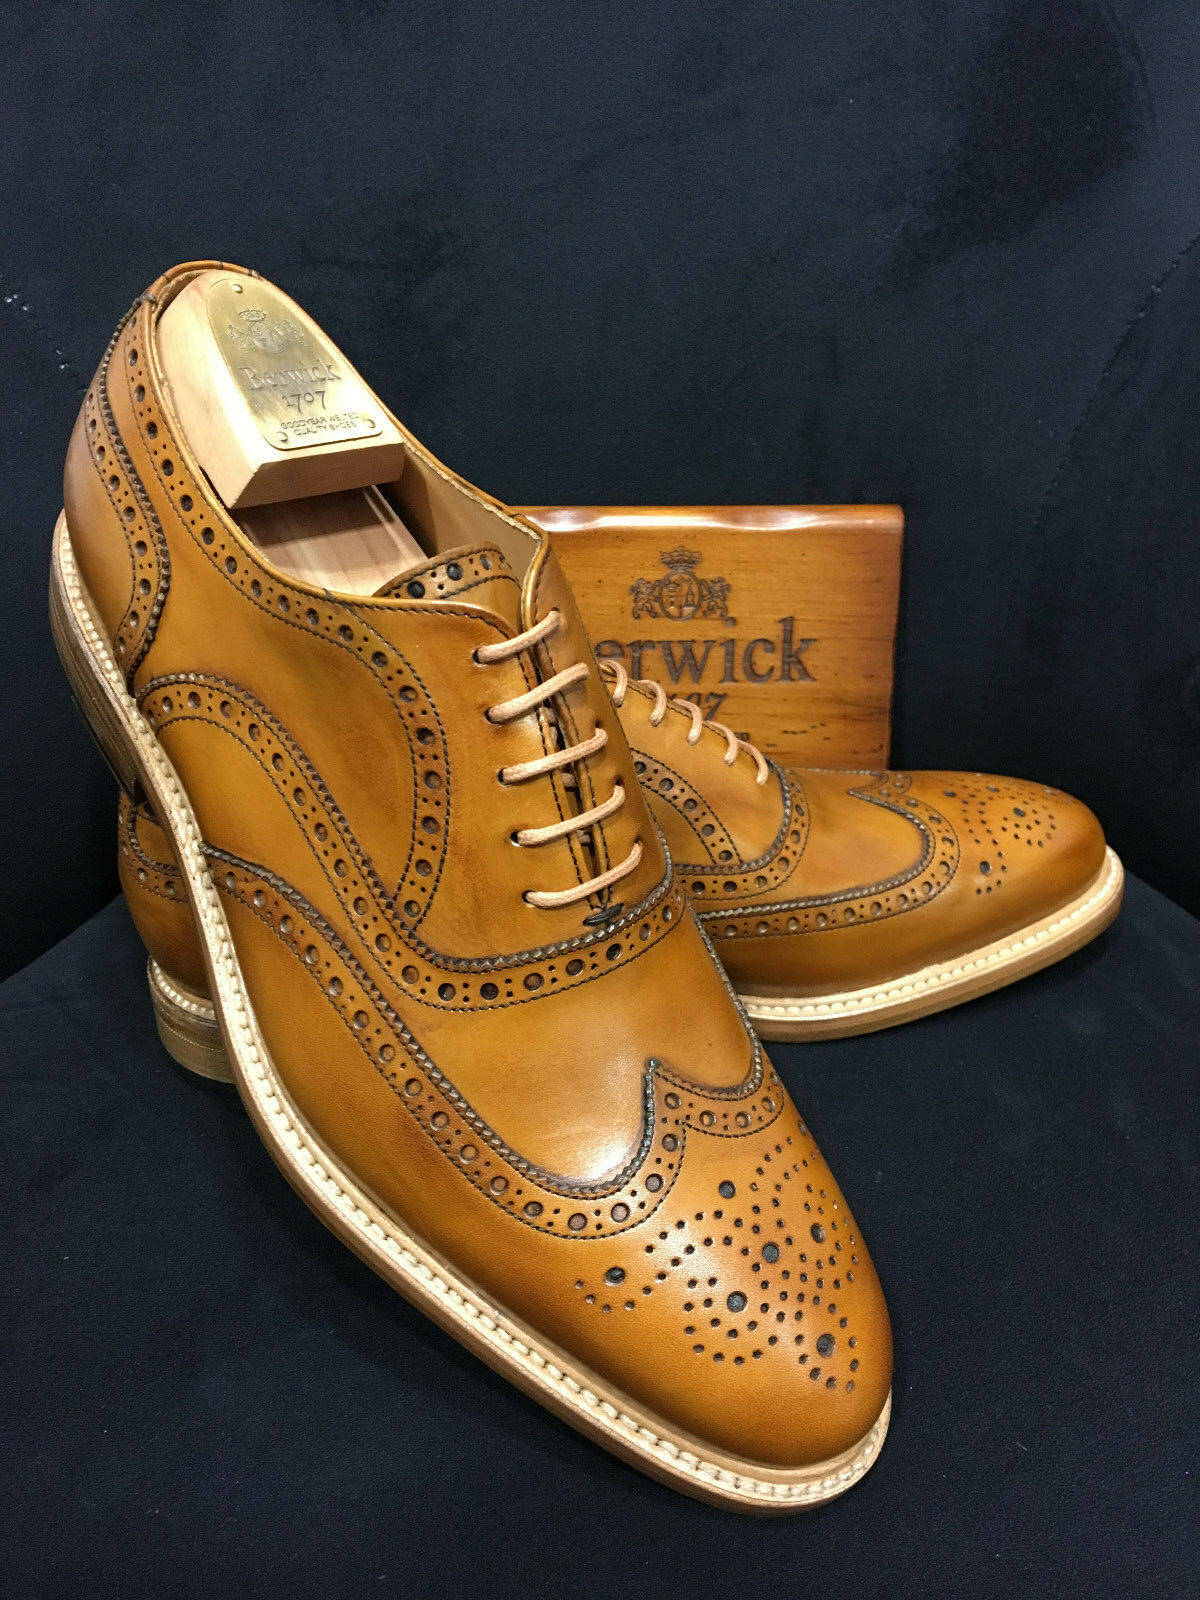 Berwick 1707 Zapatos de Cuero Oxford Coñac Goodyear Welted